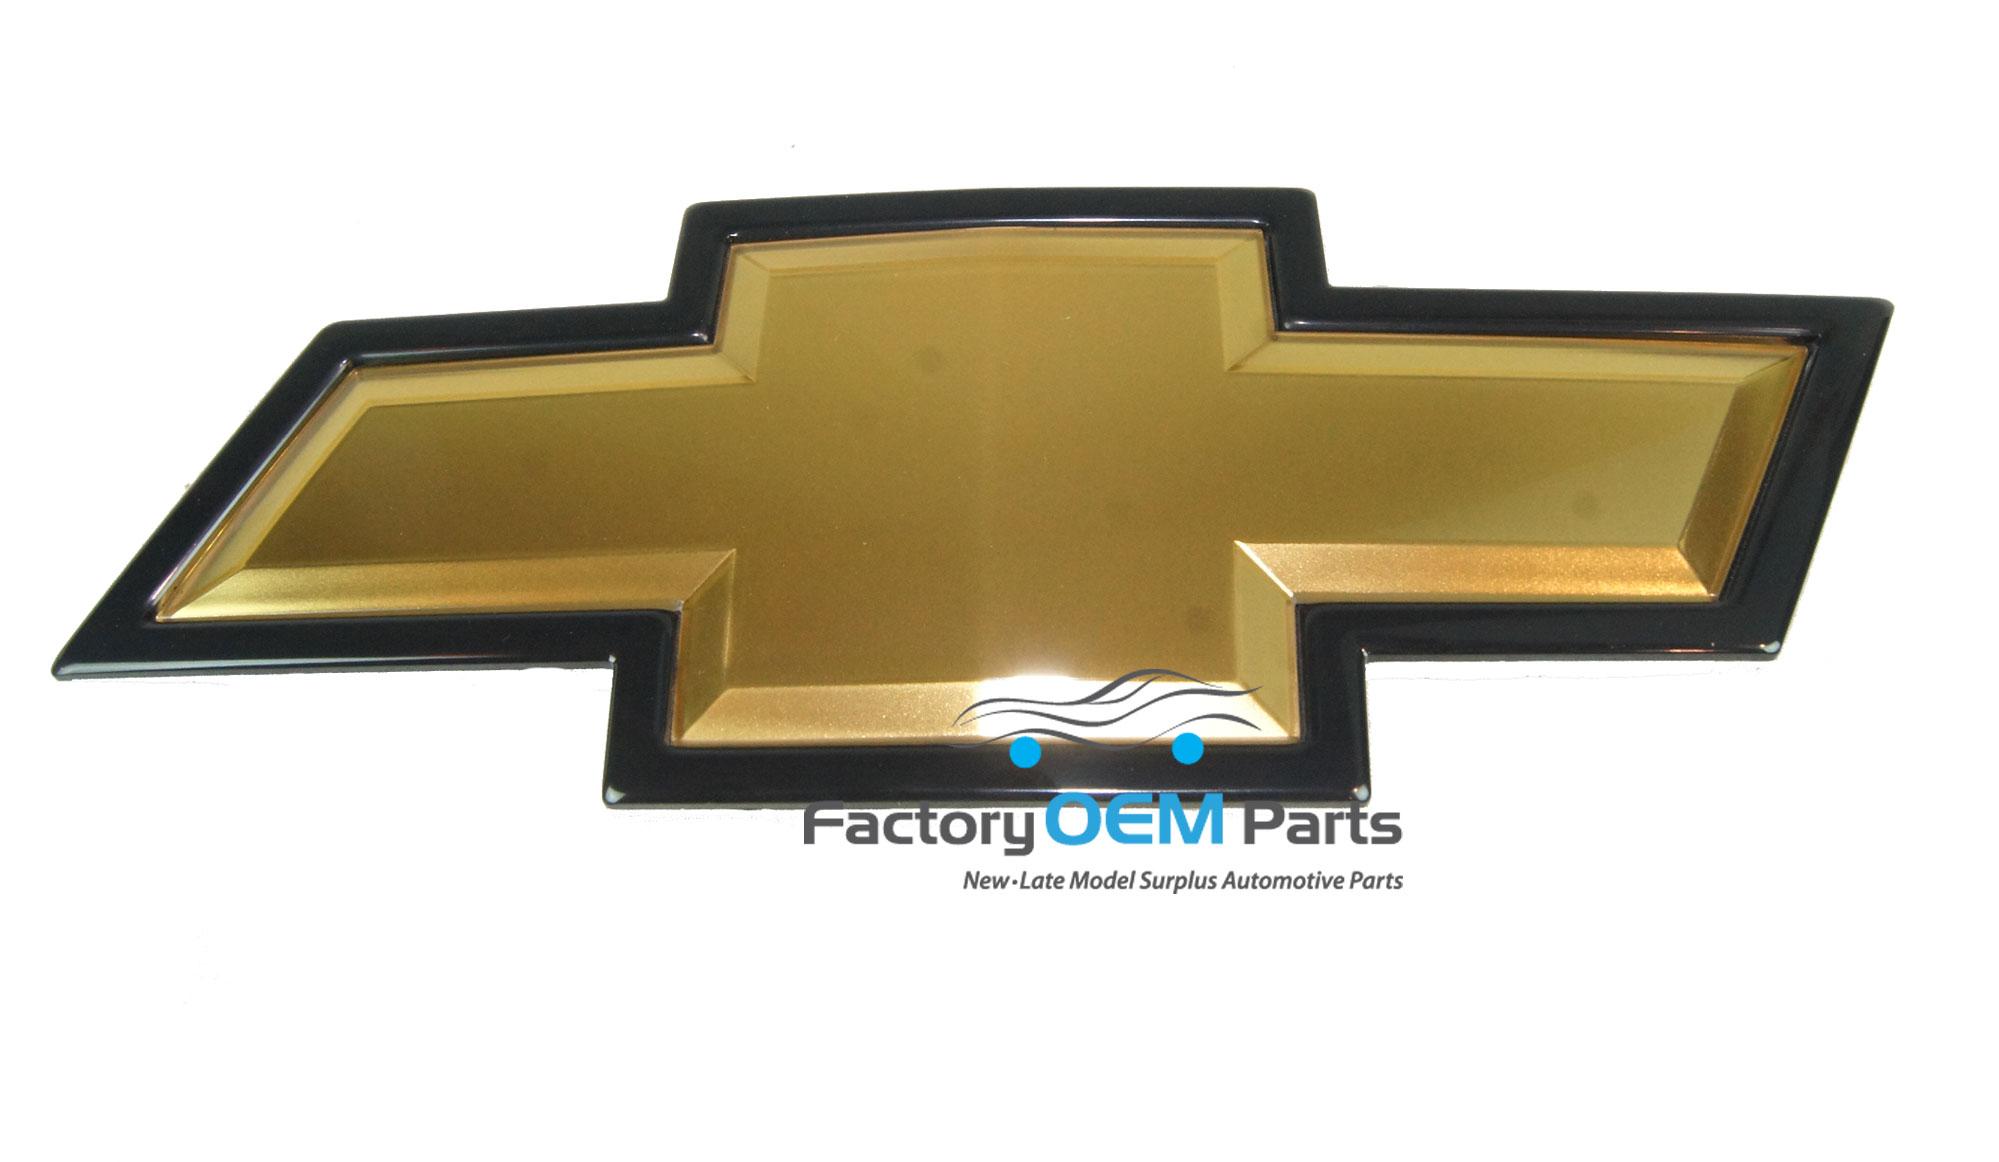 Genuine Chevrolet Chevy Bowtie Emblem HD Silverado 2500-3500 Grille 1500 Swap | eBay